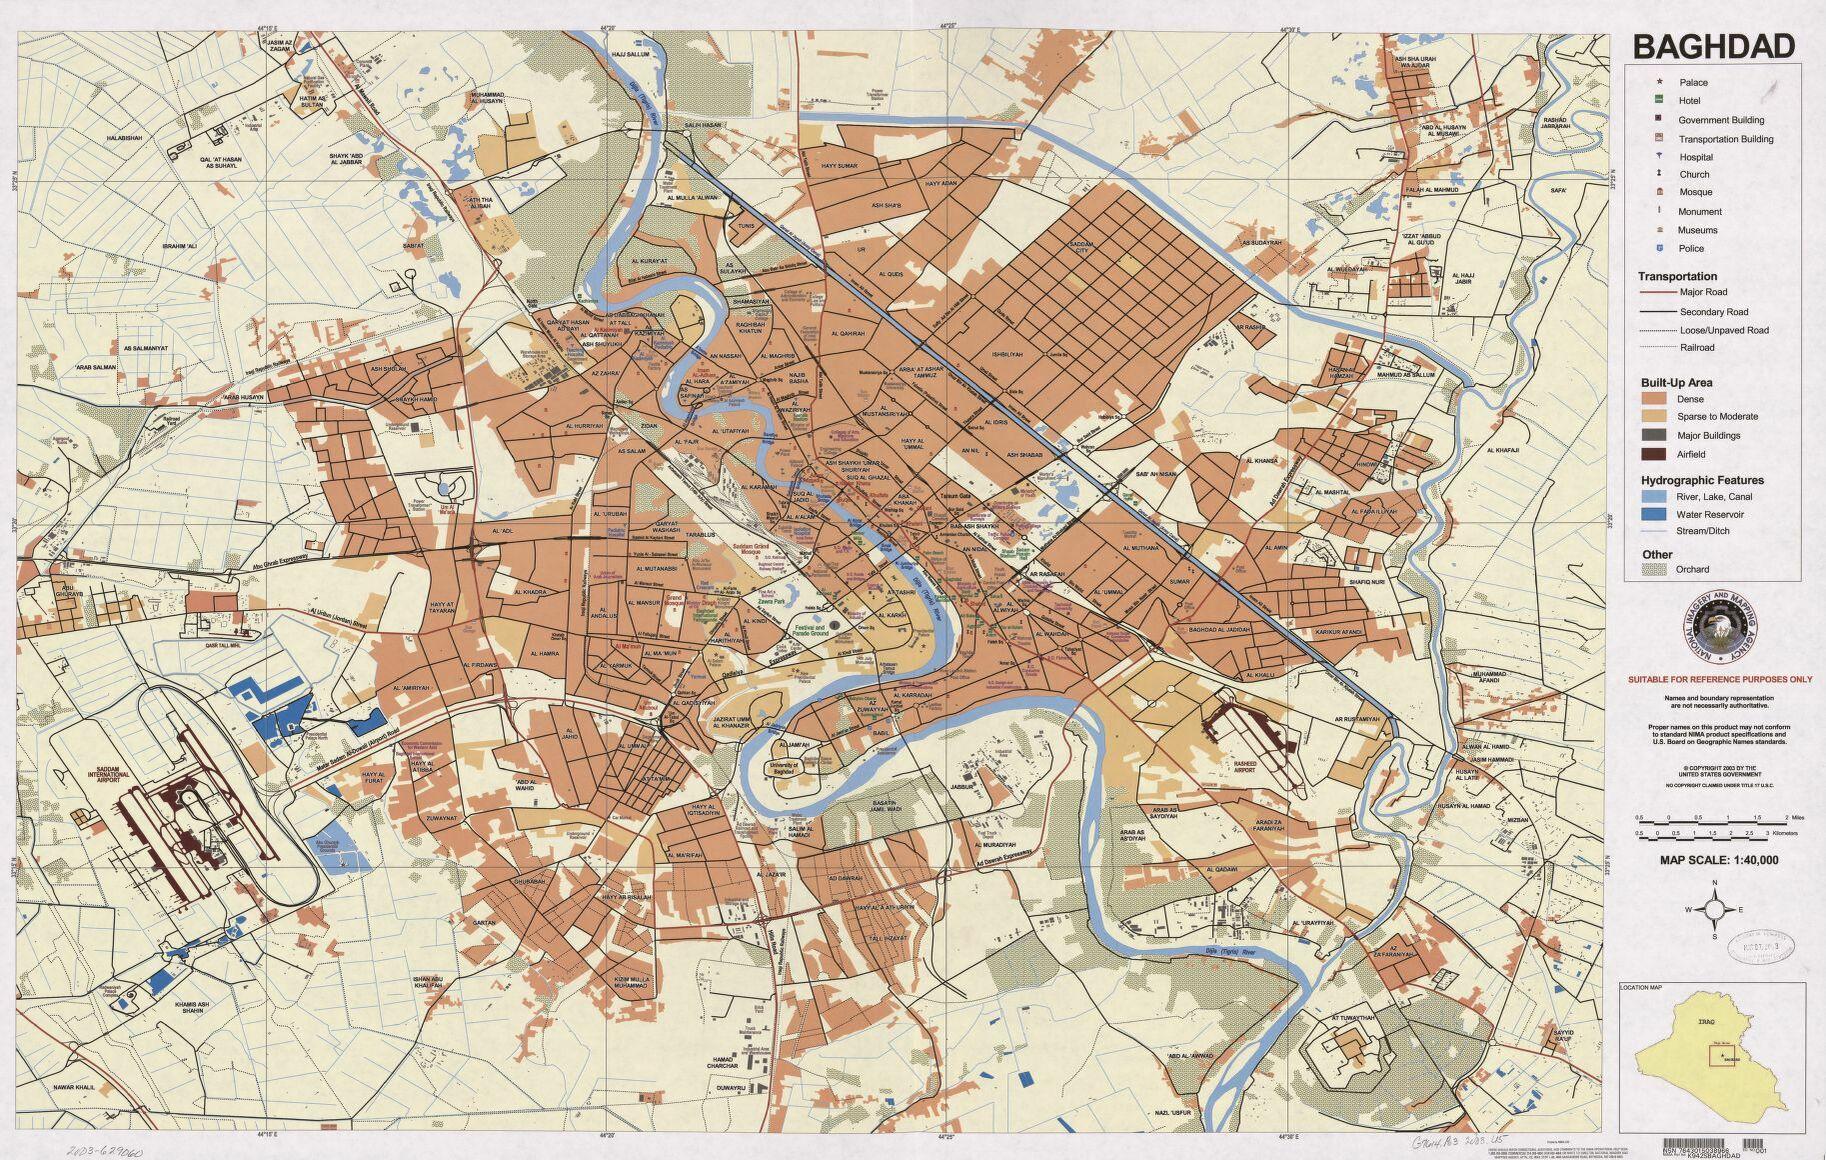 File:Map of Baghdad.jpg - Wikipedia